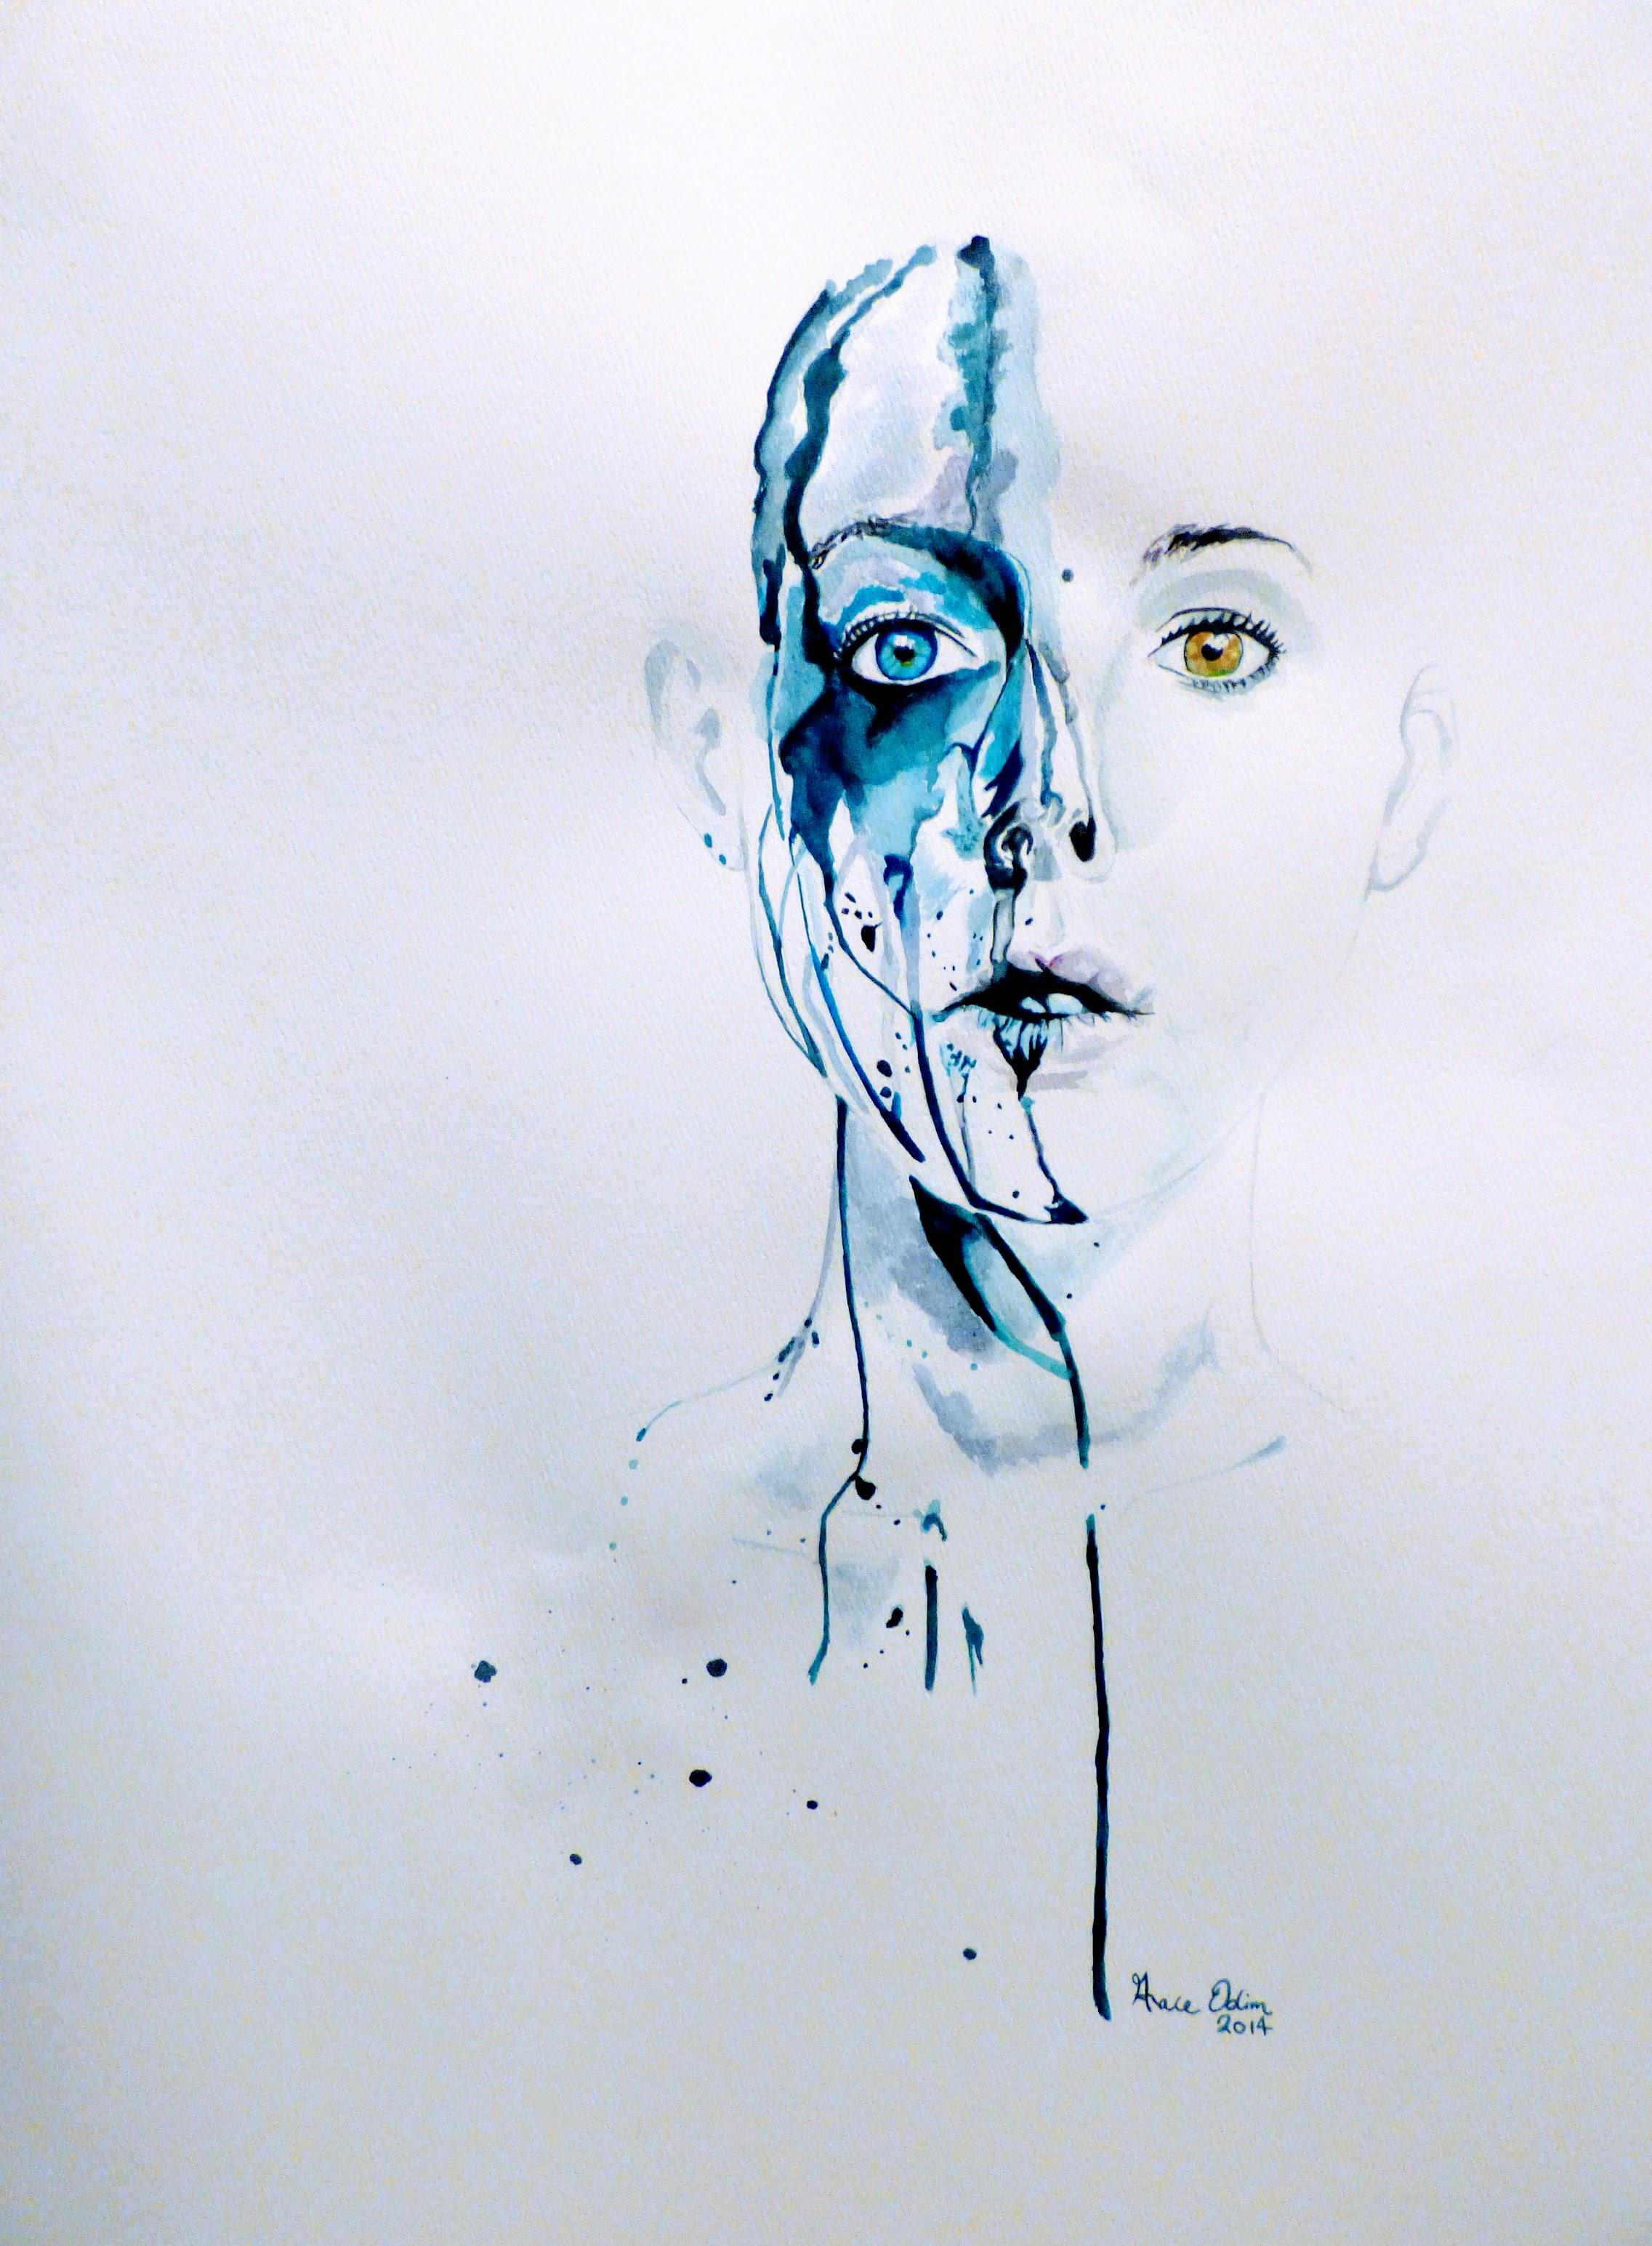 """Runny mascara"", watercolor"